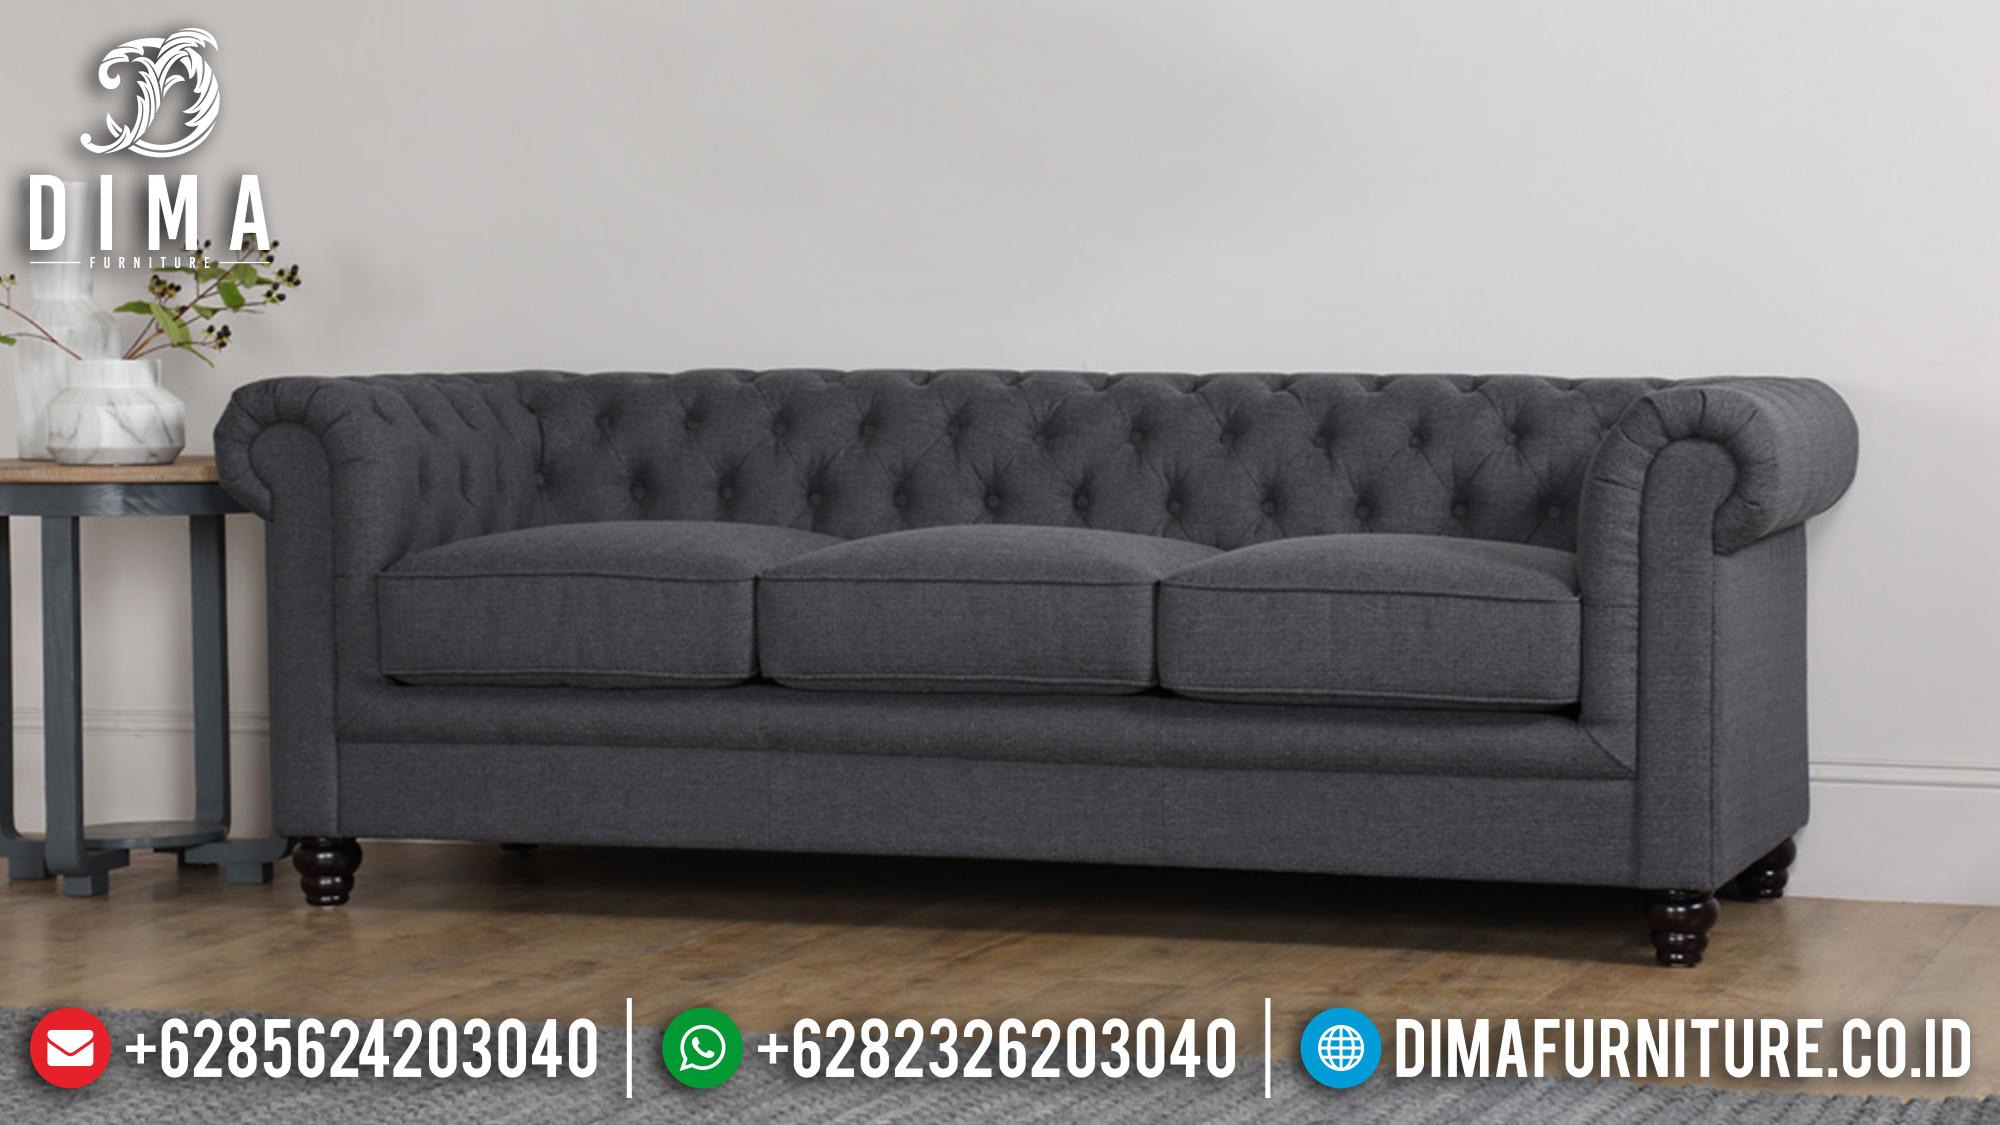 Set Sofa Tamu Minimalis Mewah Jepara Fabric Canvas Terbaru 2018 ST-0525 Gambar 1